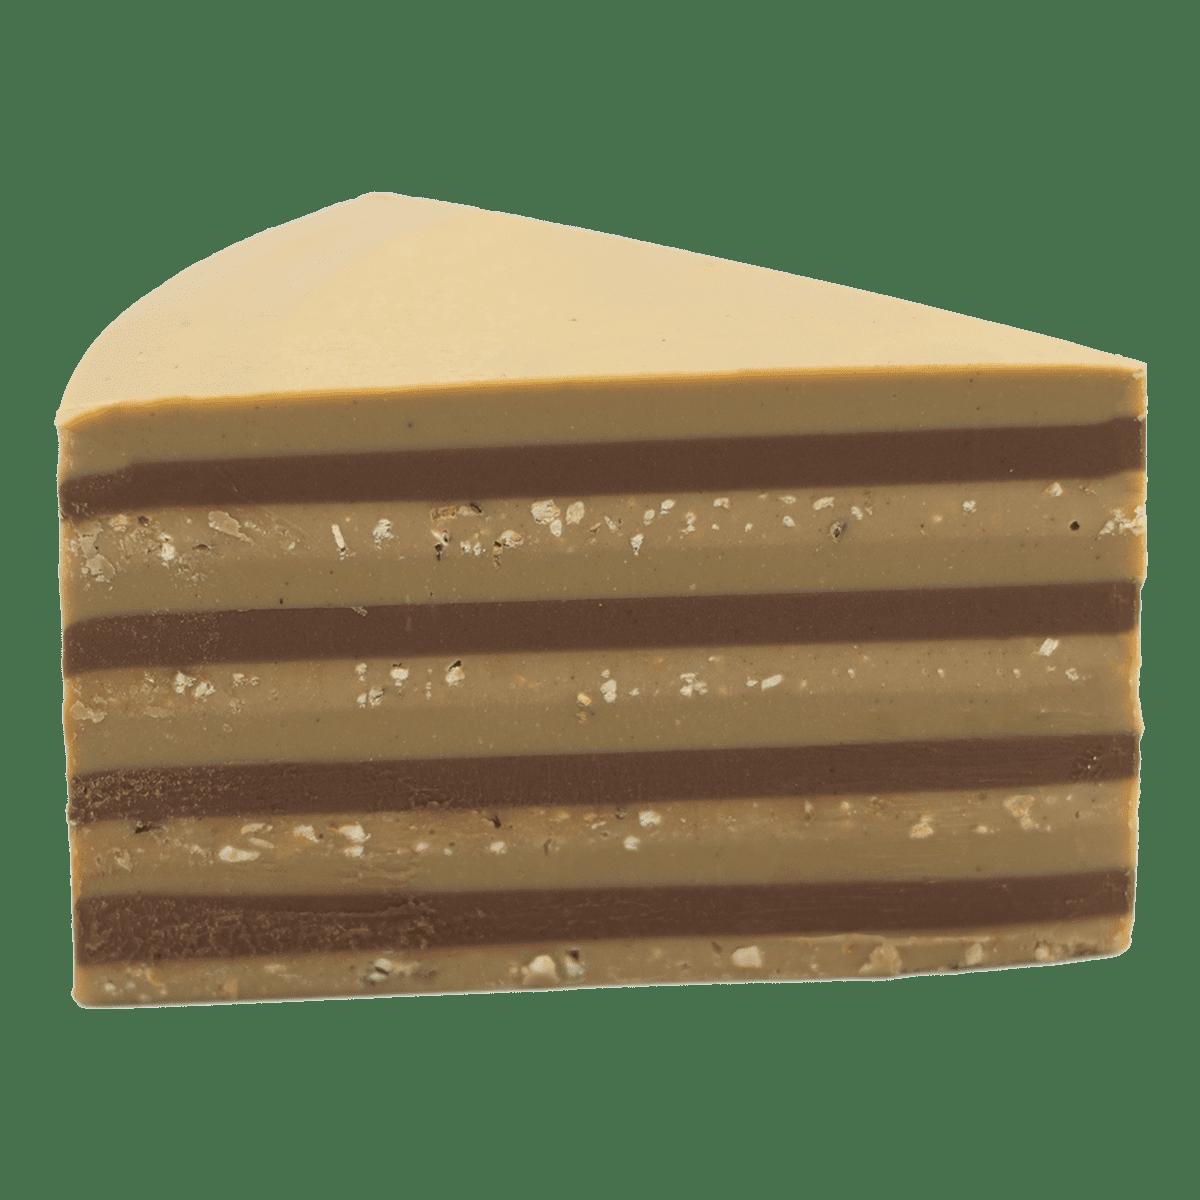 Ottavio gianduia al latte, cioccolato bianco e pistacchi, gianduia bianco